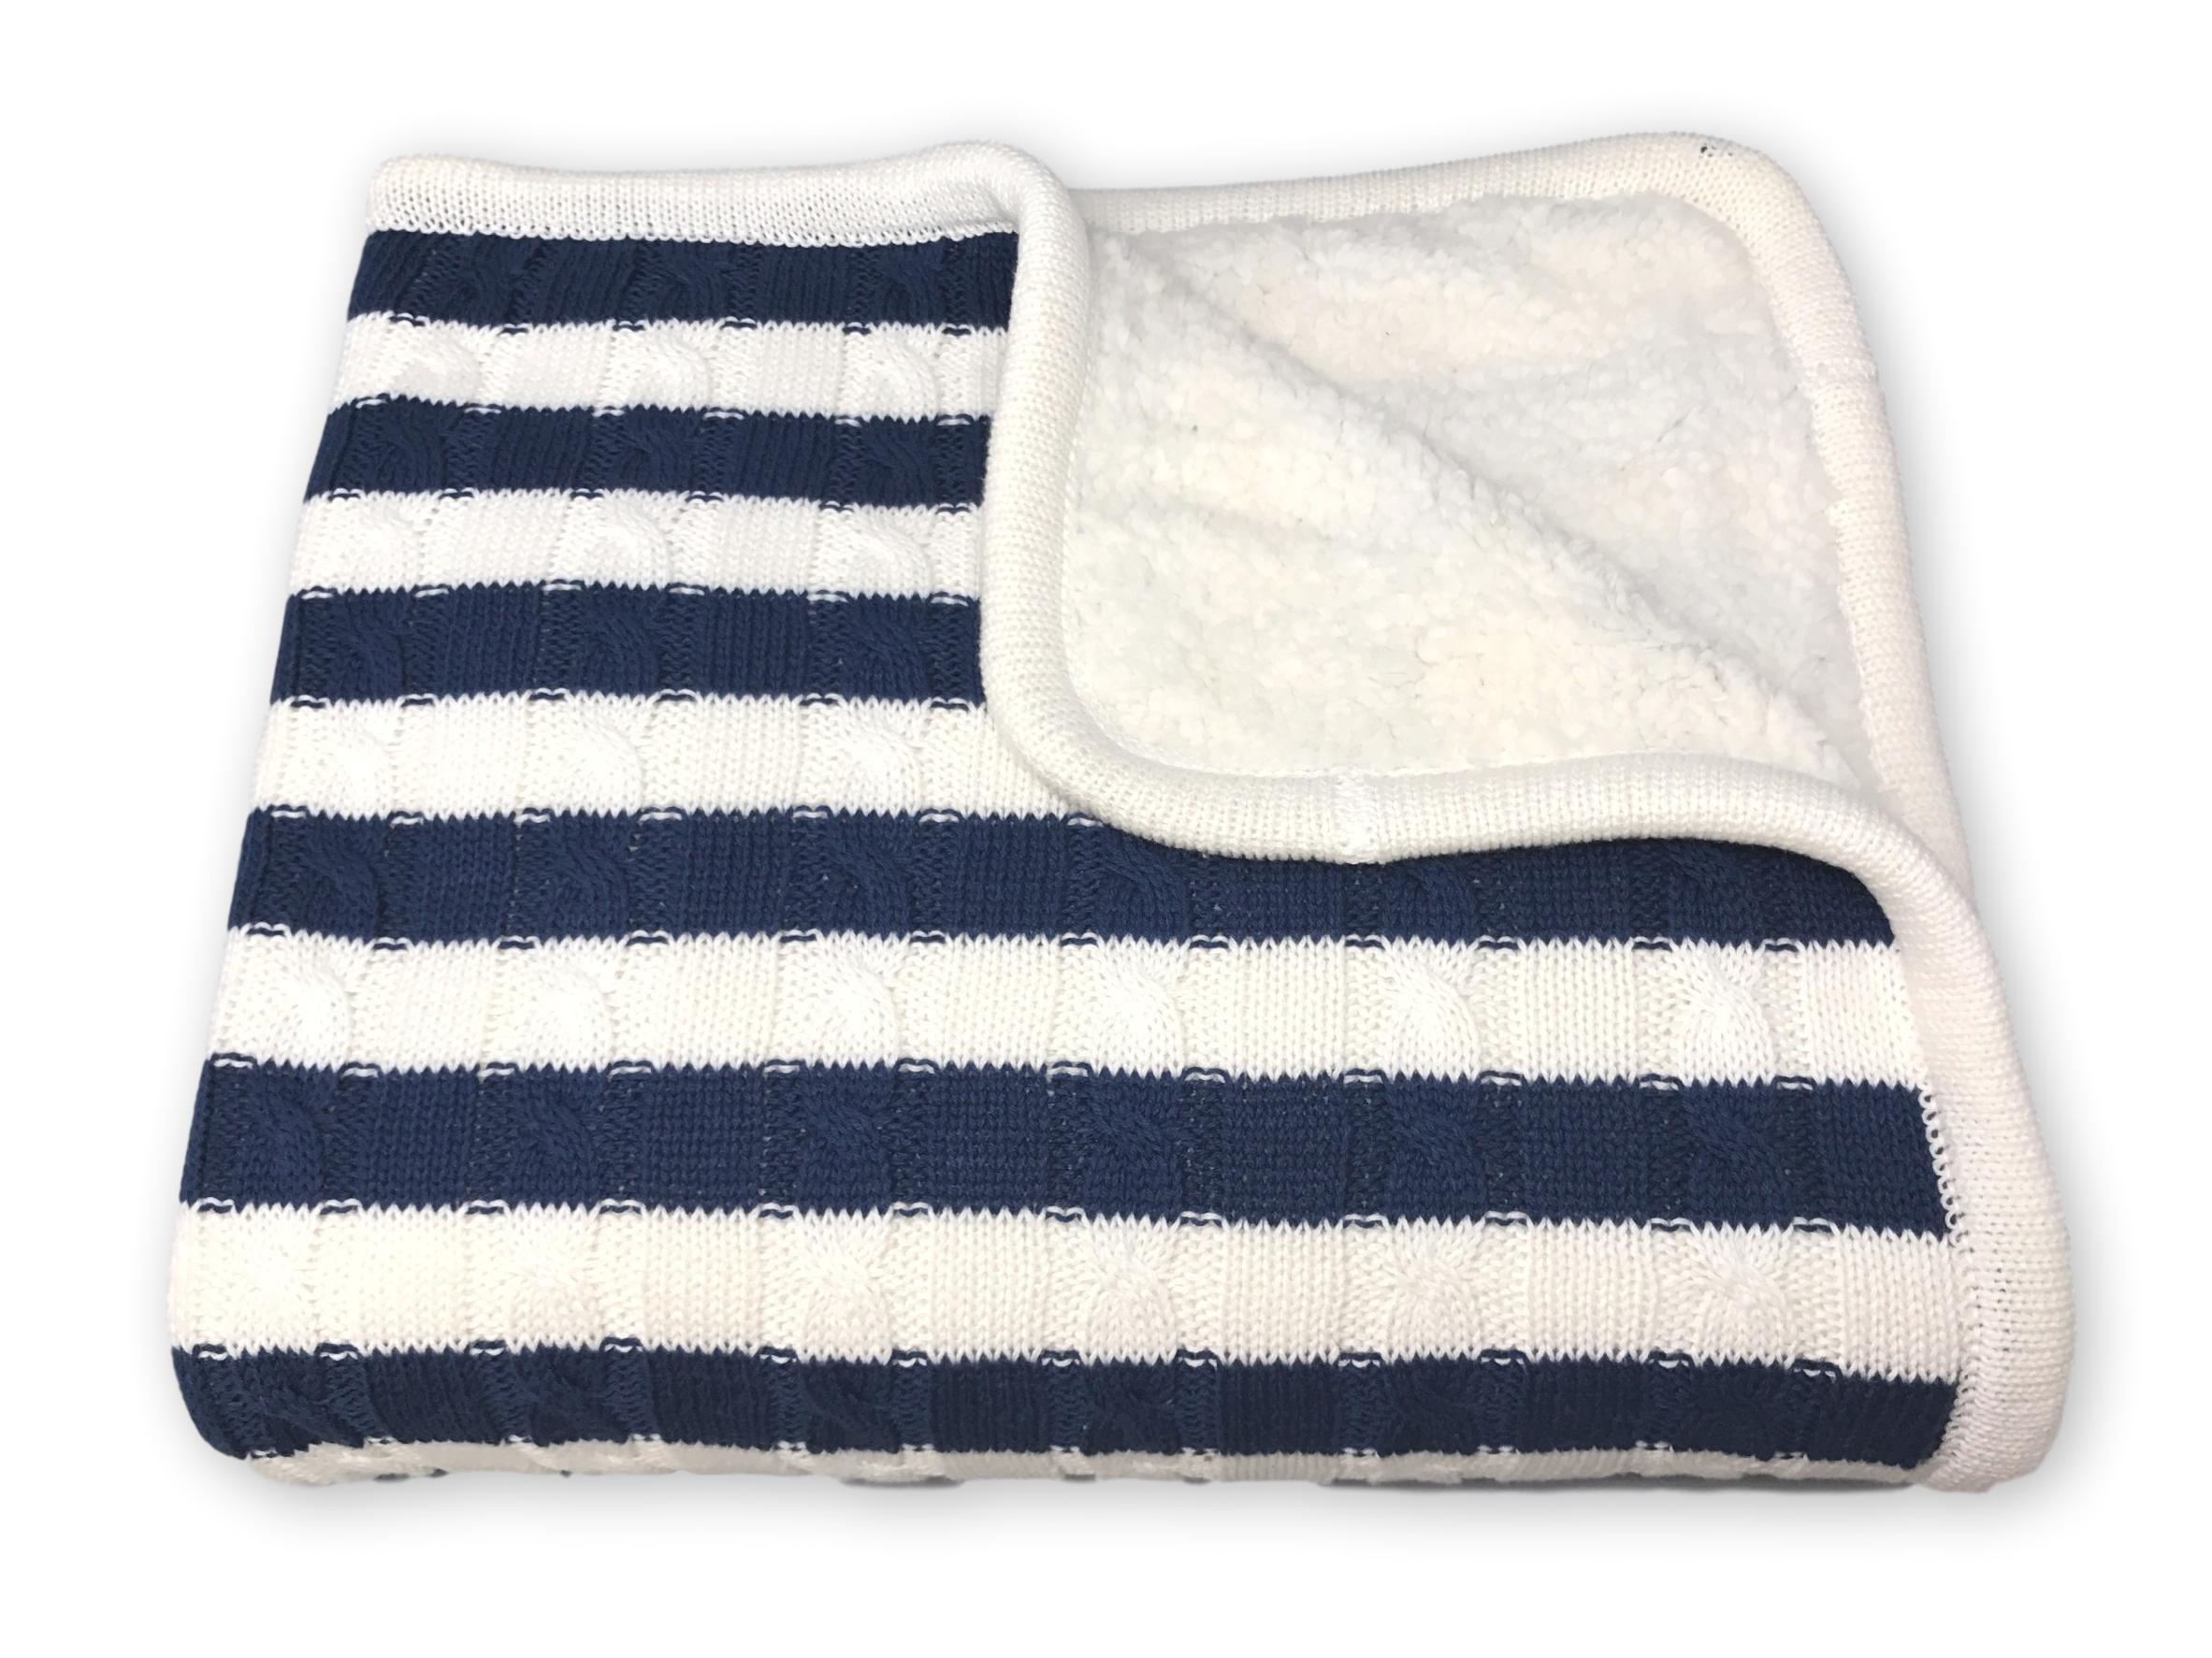 effe bebe Sweet Stripe Cotton Cable Knit Sherpa Baby Blanket 30''x40'' Navy